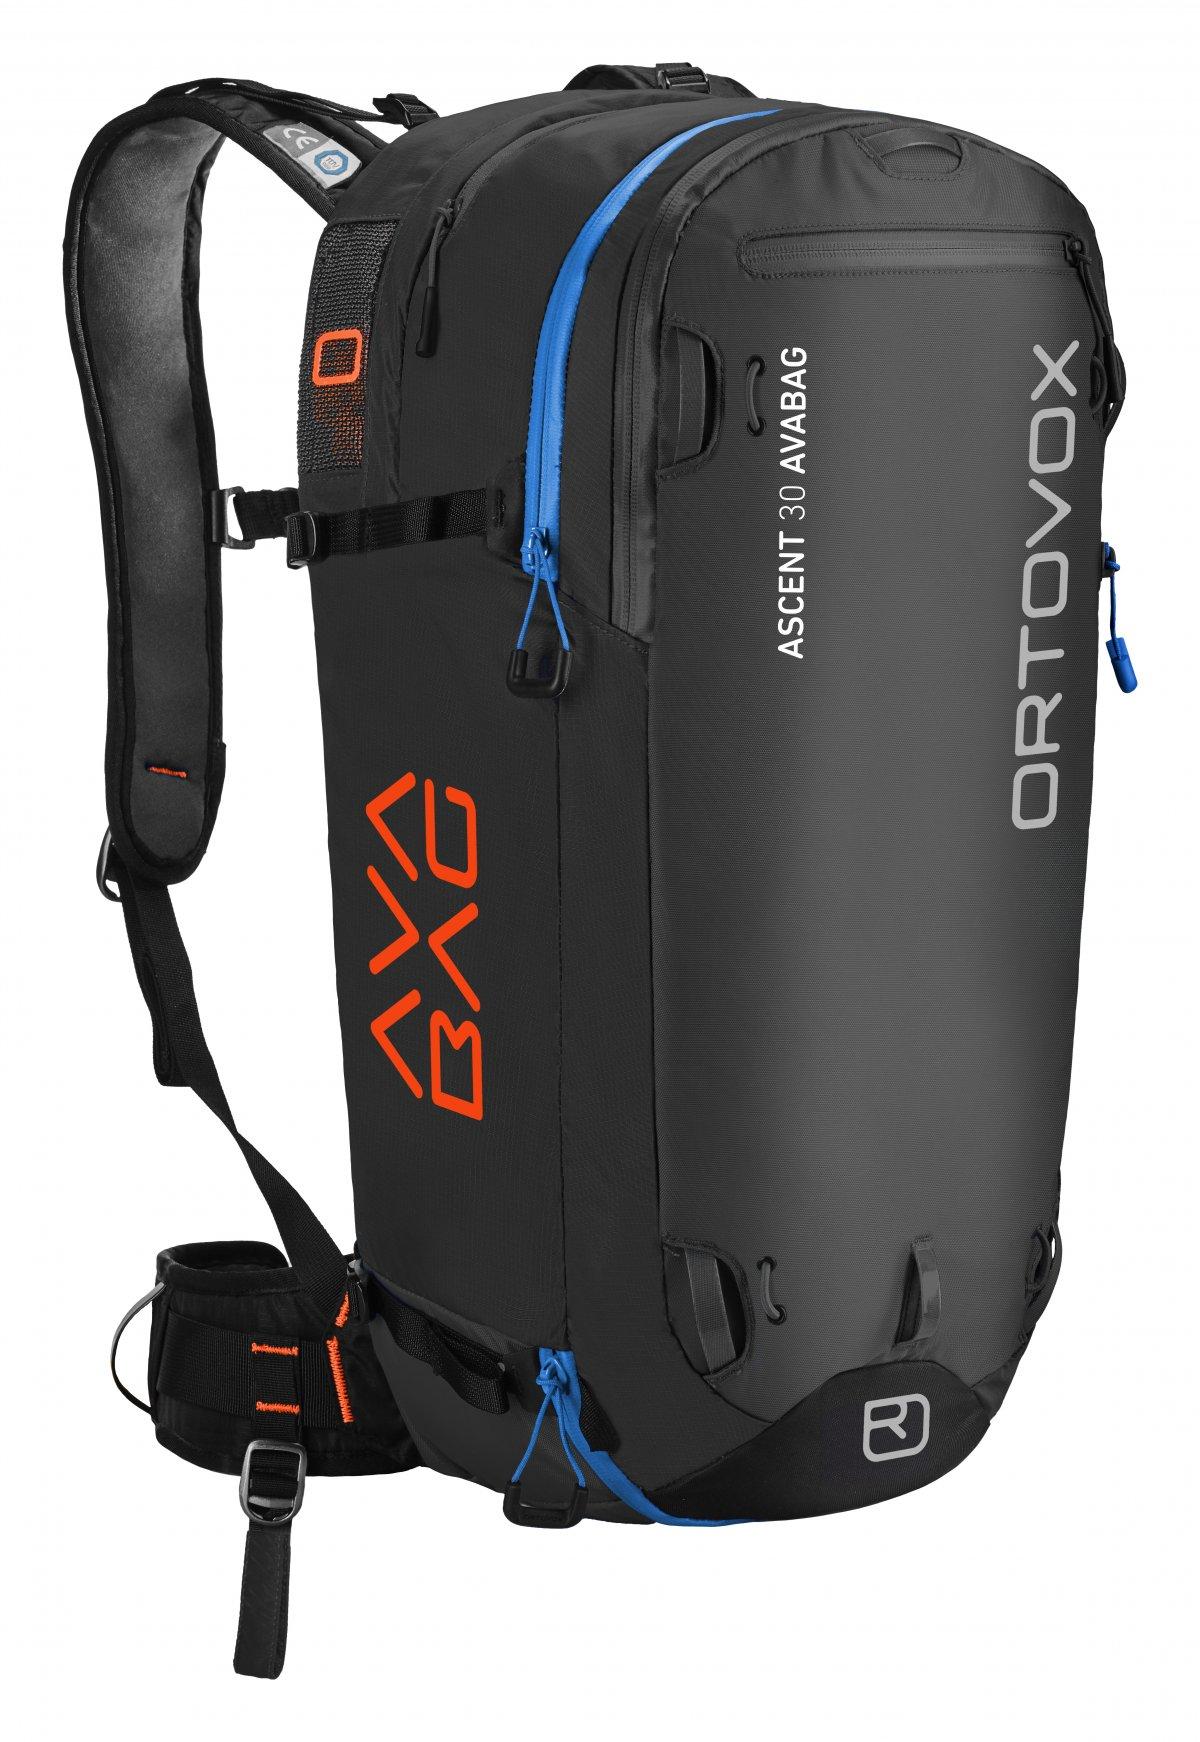 Front View - Black Anthracite - Ortovox Ascent 30 Avabag Backpack